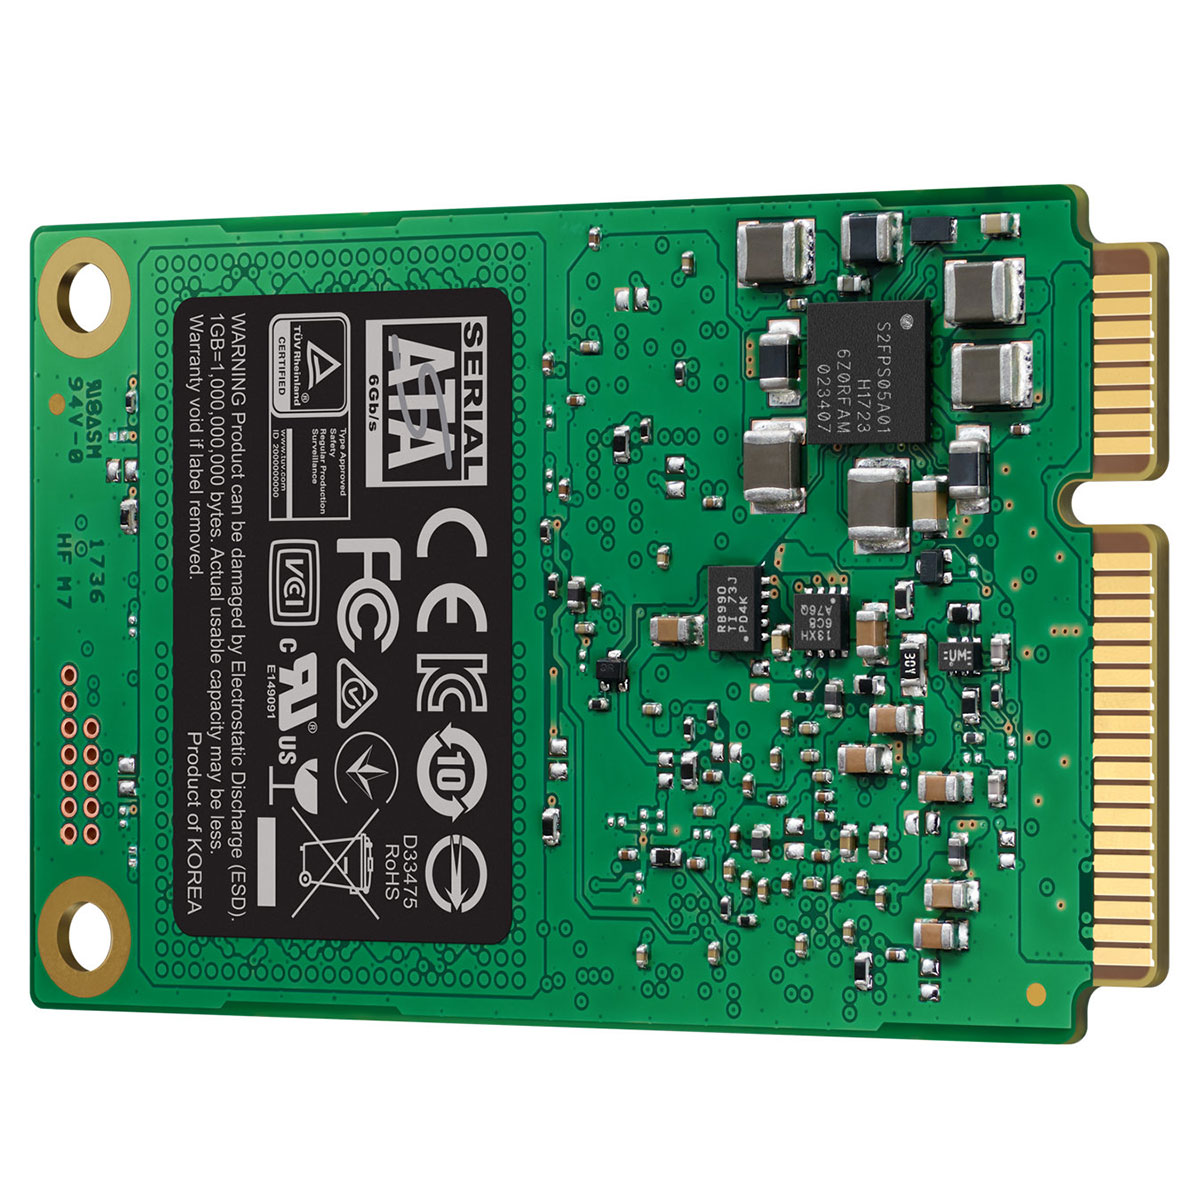 Samsung 860 EVO 240-275Go mSATA - Disque SSD Samsung - Cybertek.fr - 2